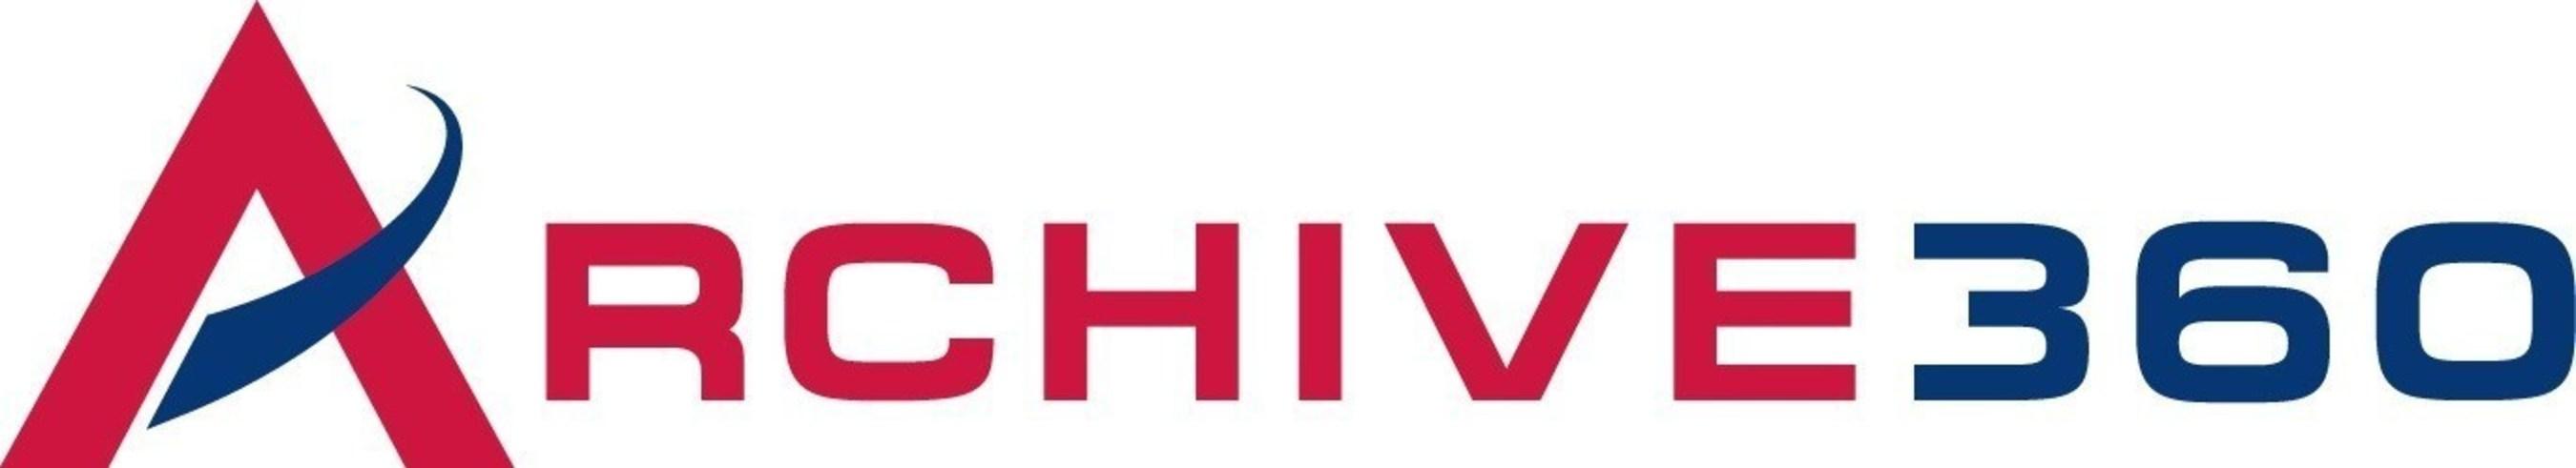 Archive360 Logo